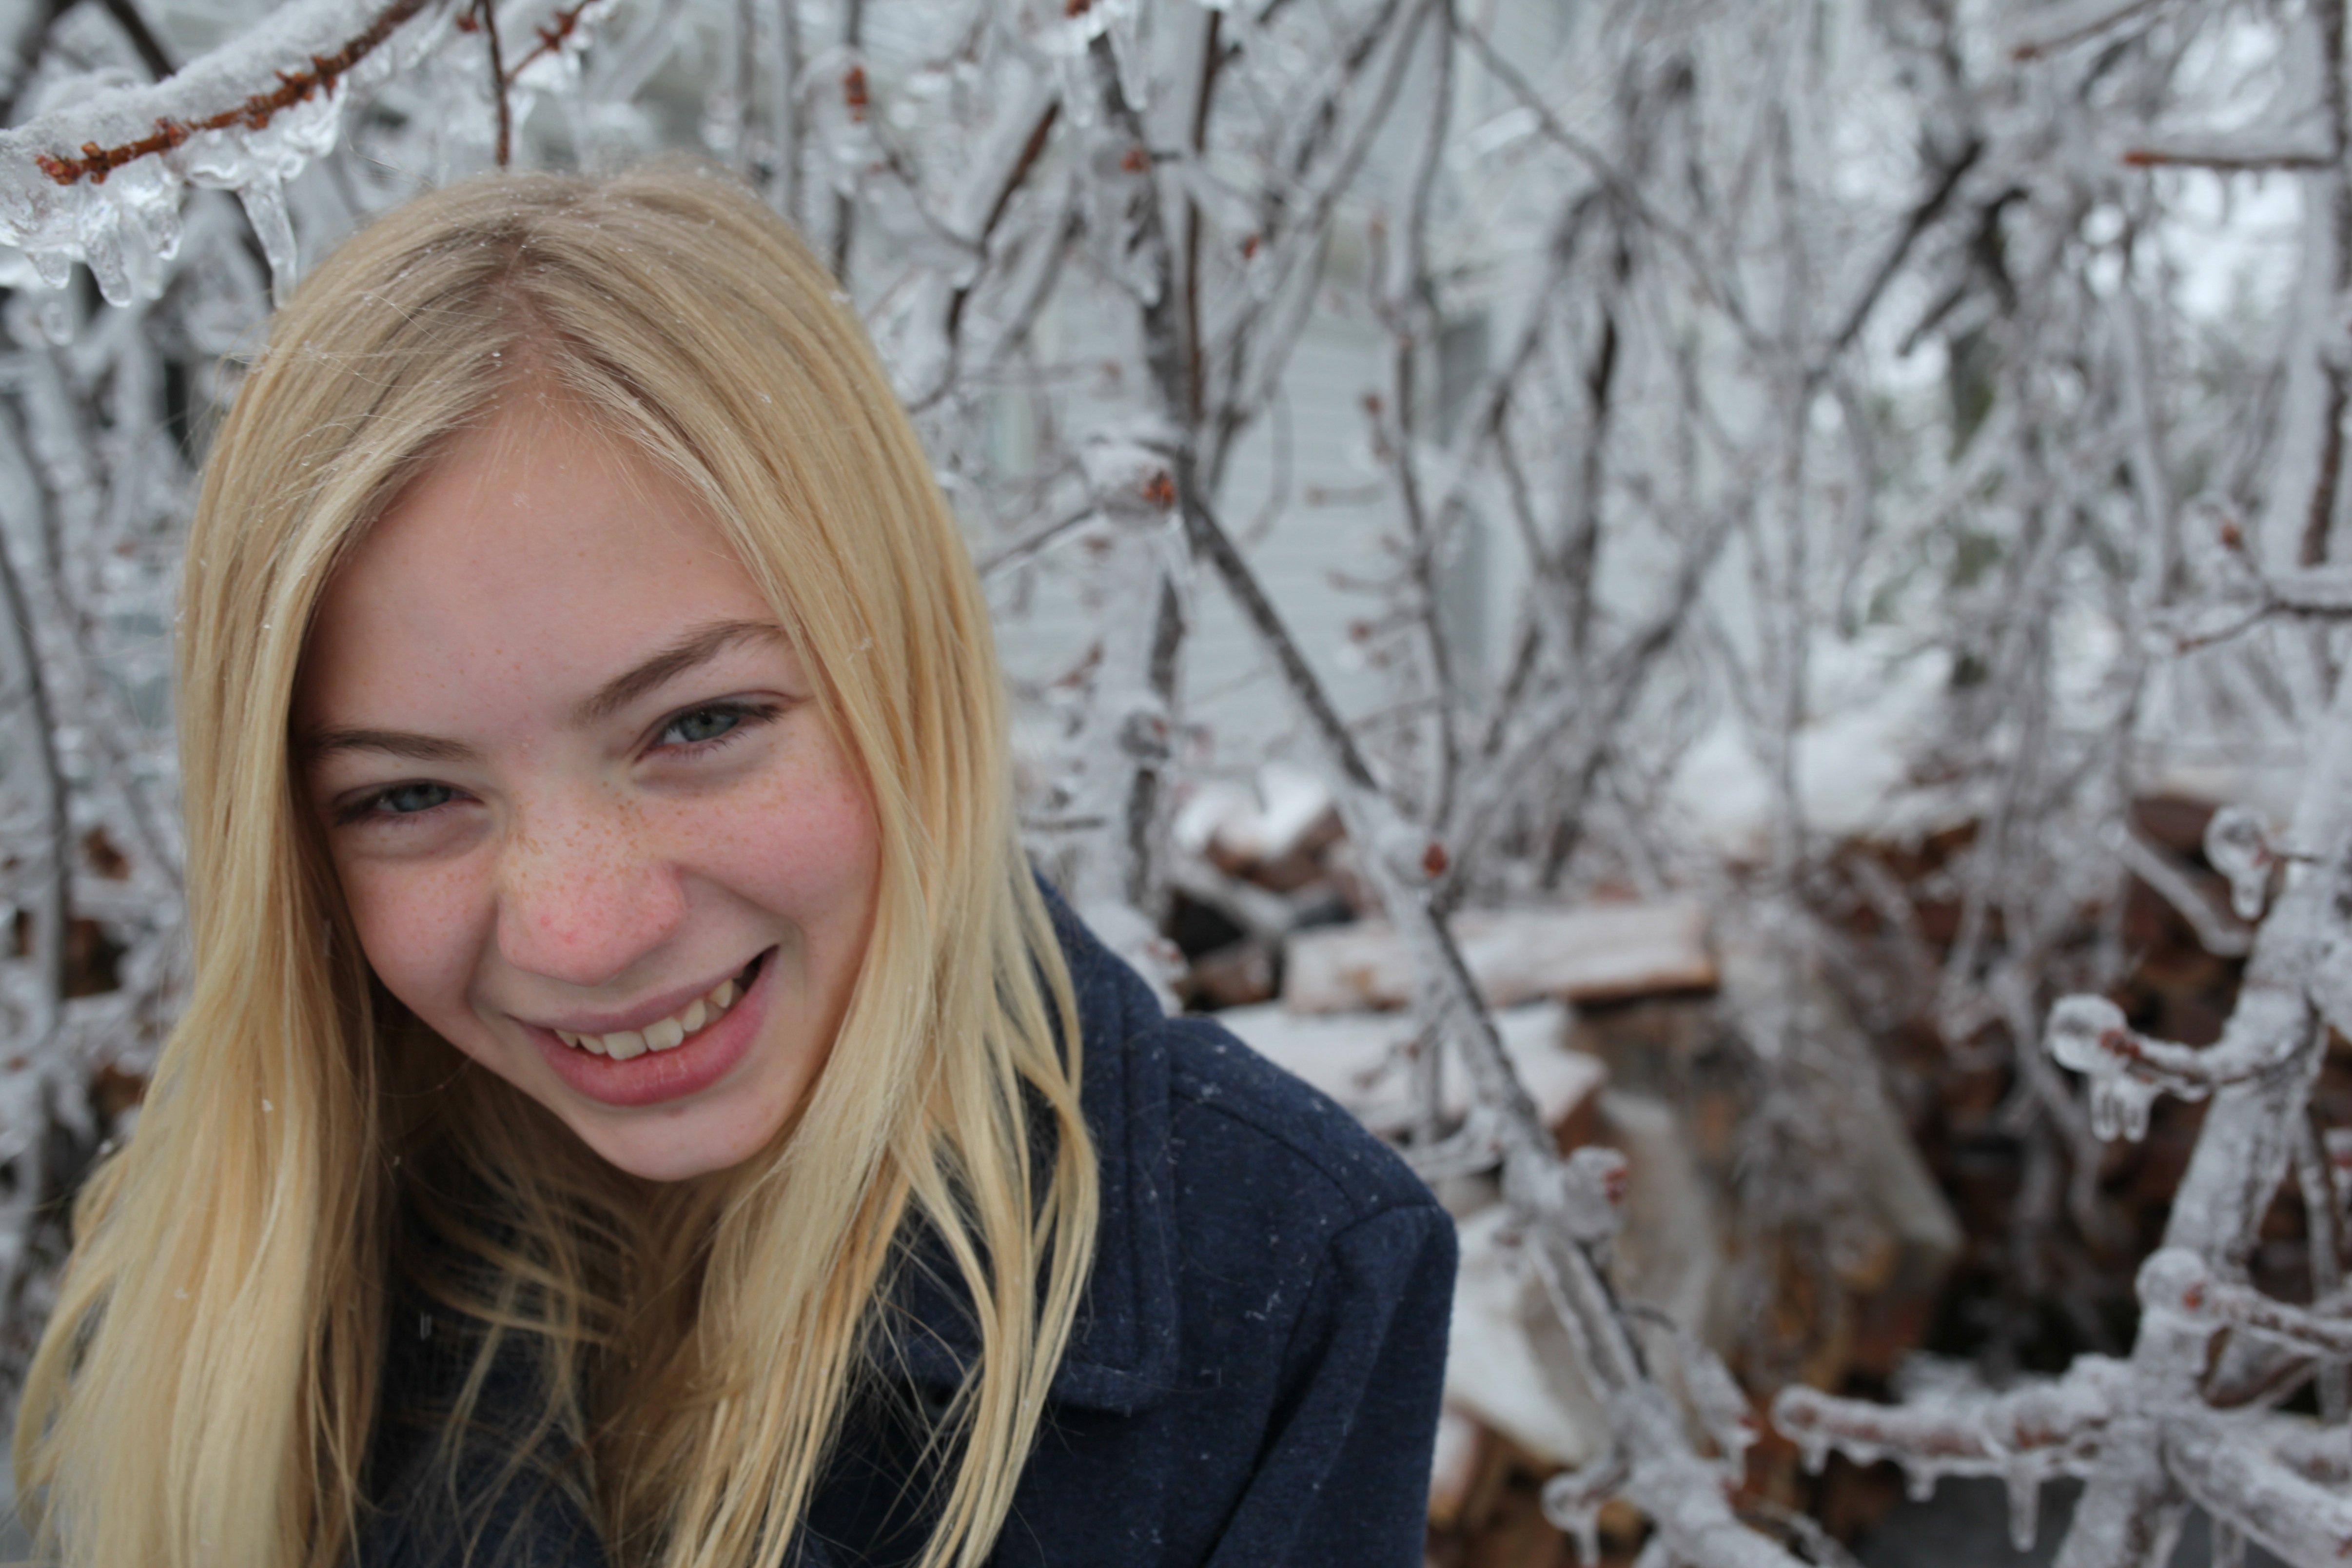 ice storm; Tay